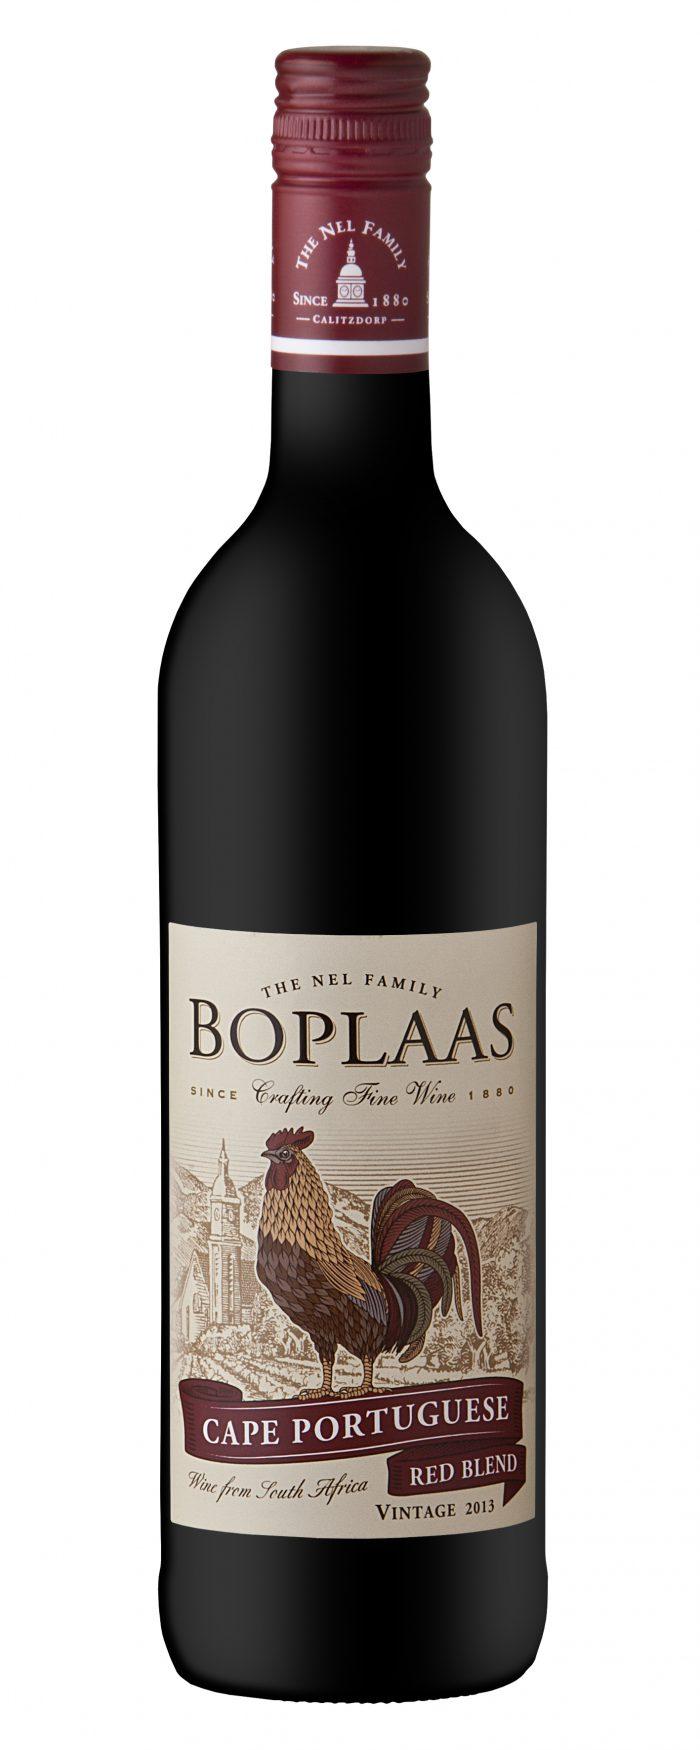 Boplaas Cape Portuguese Red   Zuid-Afrika   gemaakt van de druif: Shiraz, Tinta Barroca, Touriga Franca